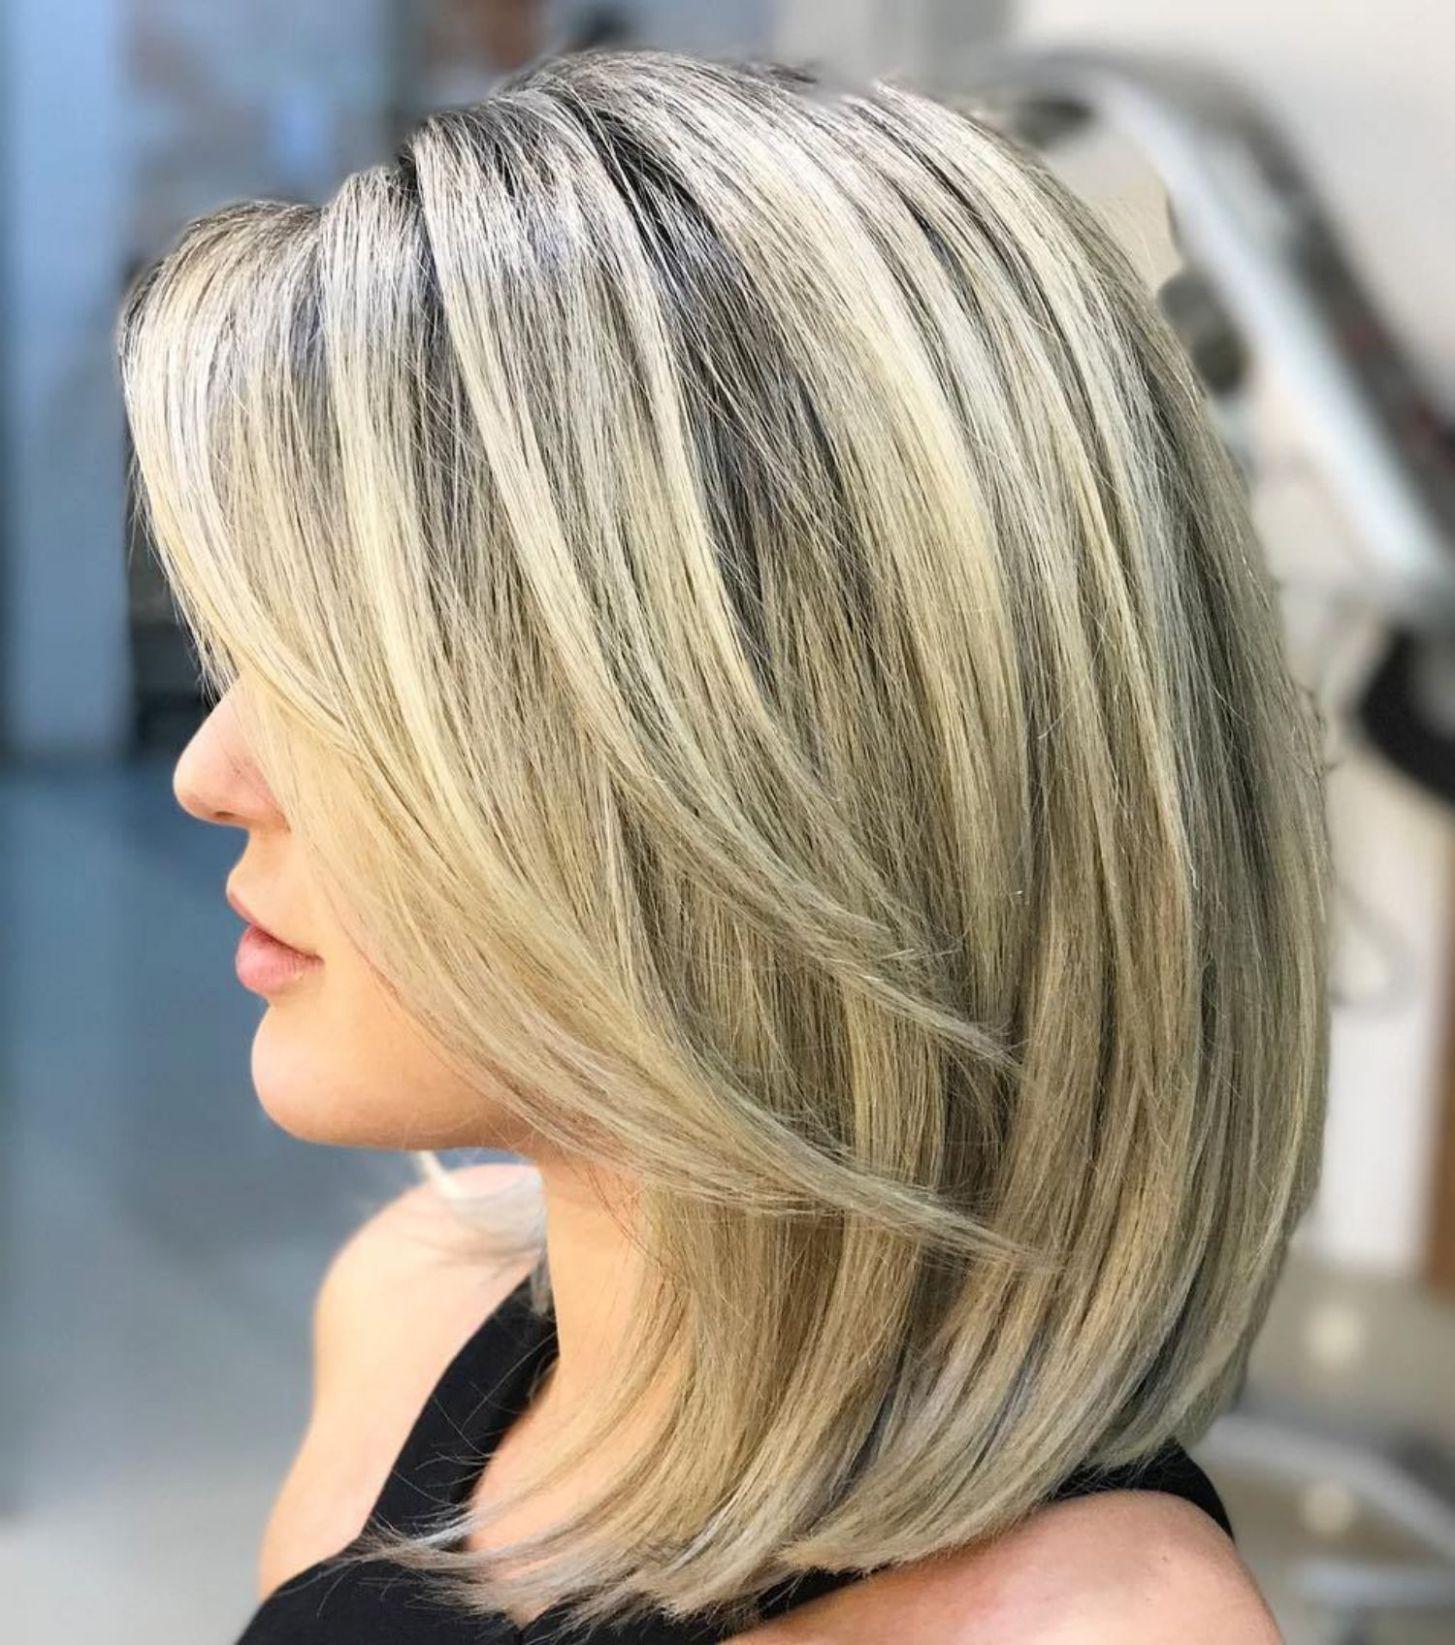 60 fun and flattering medium hairstyles for women | hair